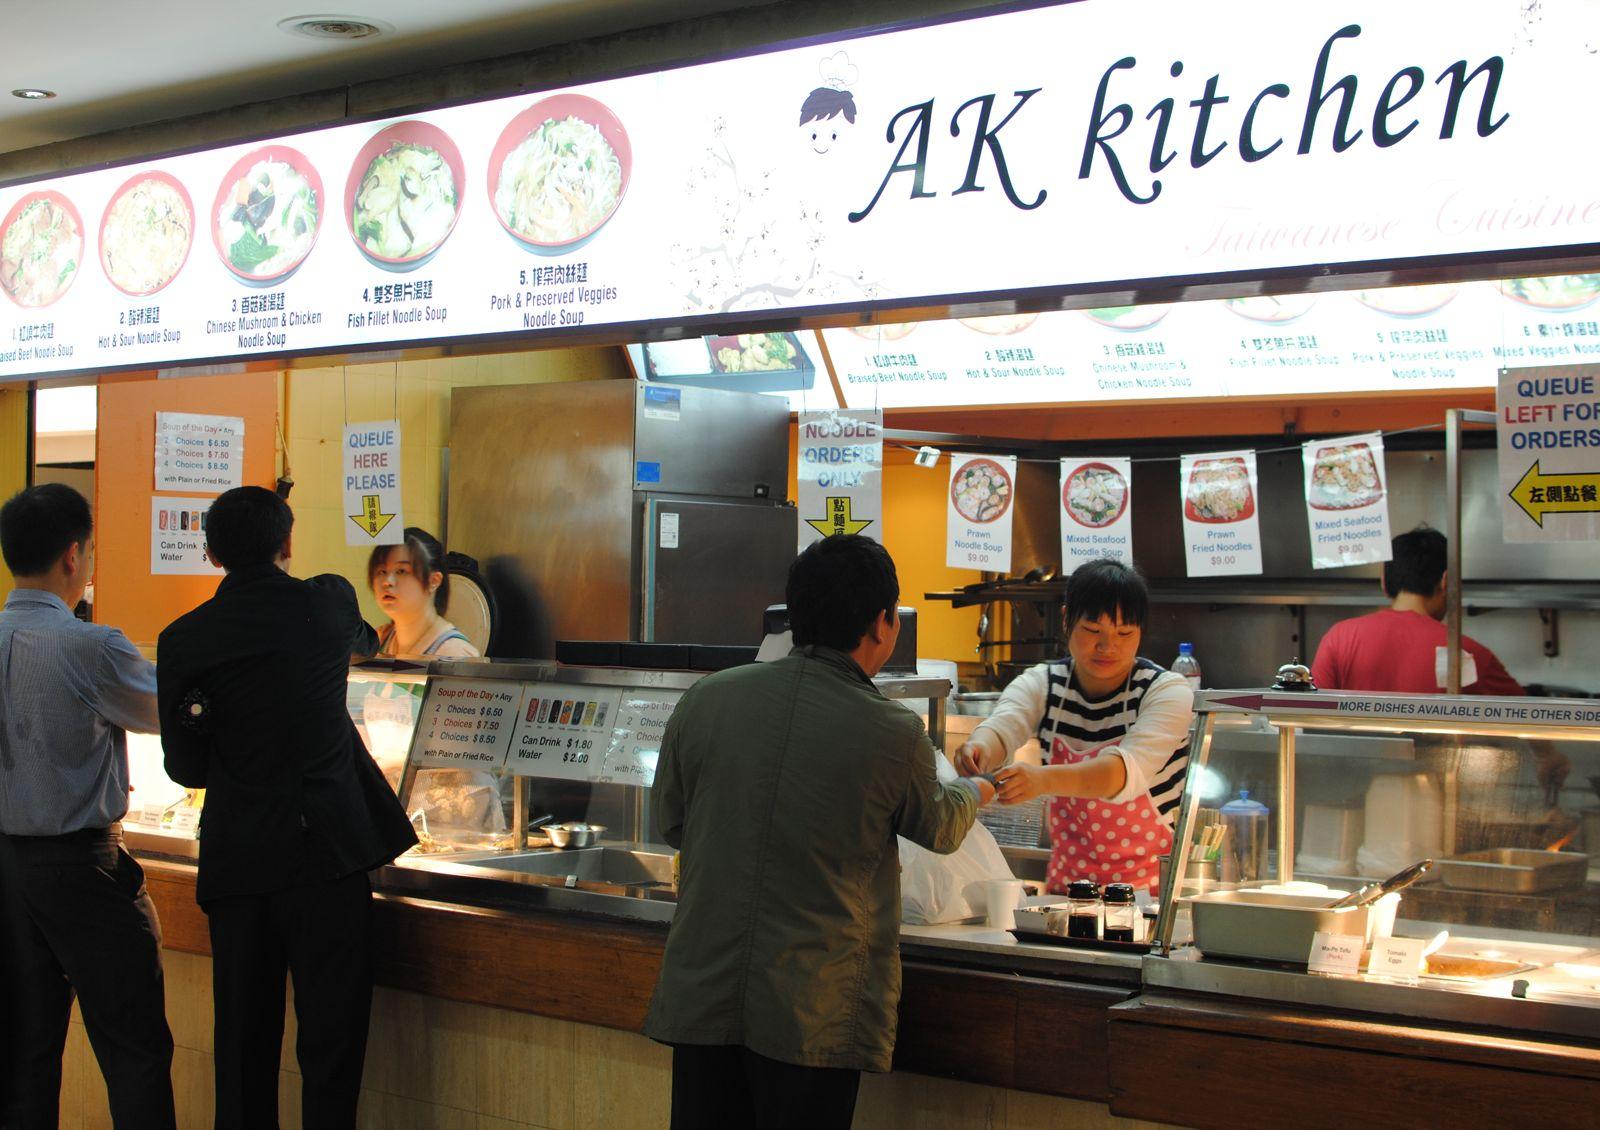 Richard elliot 39 s blog restaurant review ak kitchen for A kitchen connection